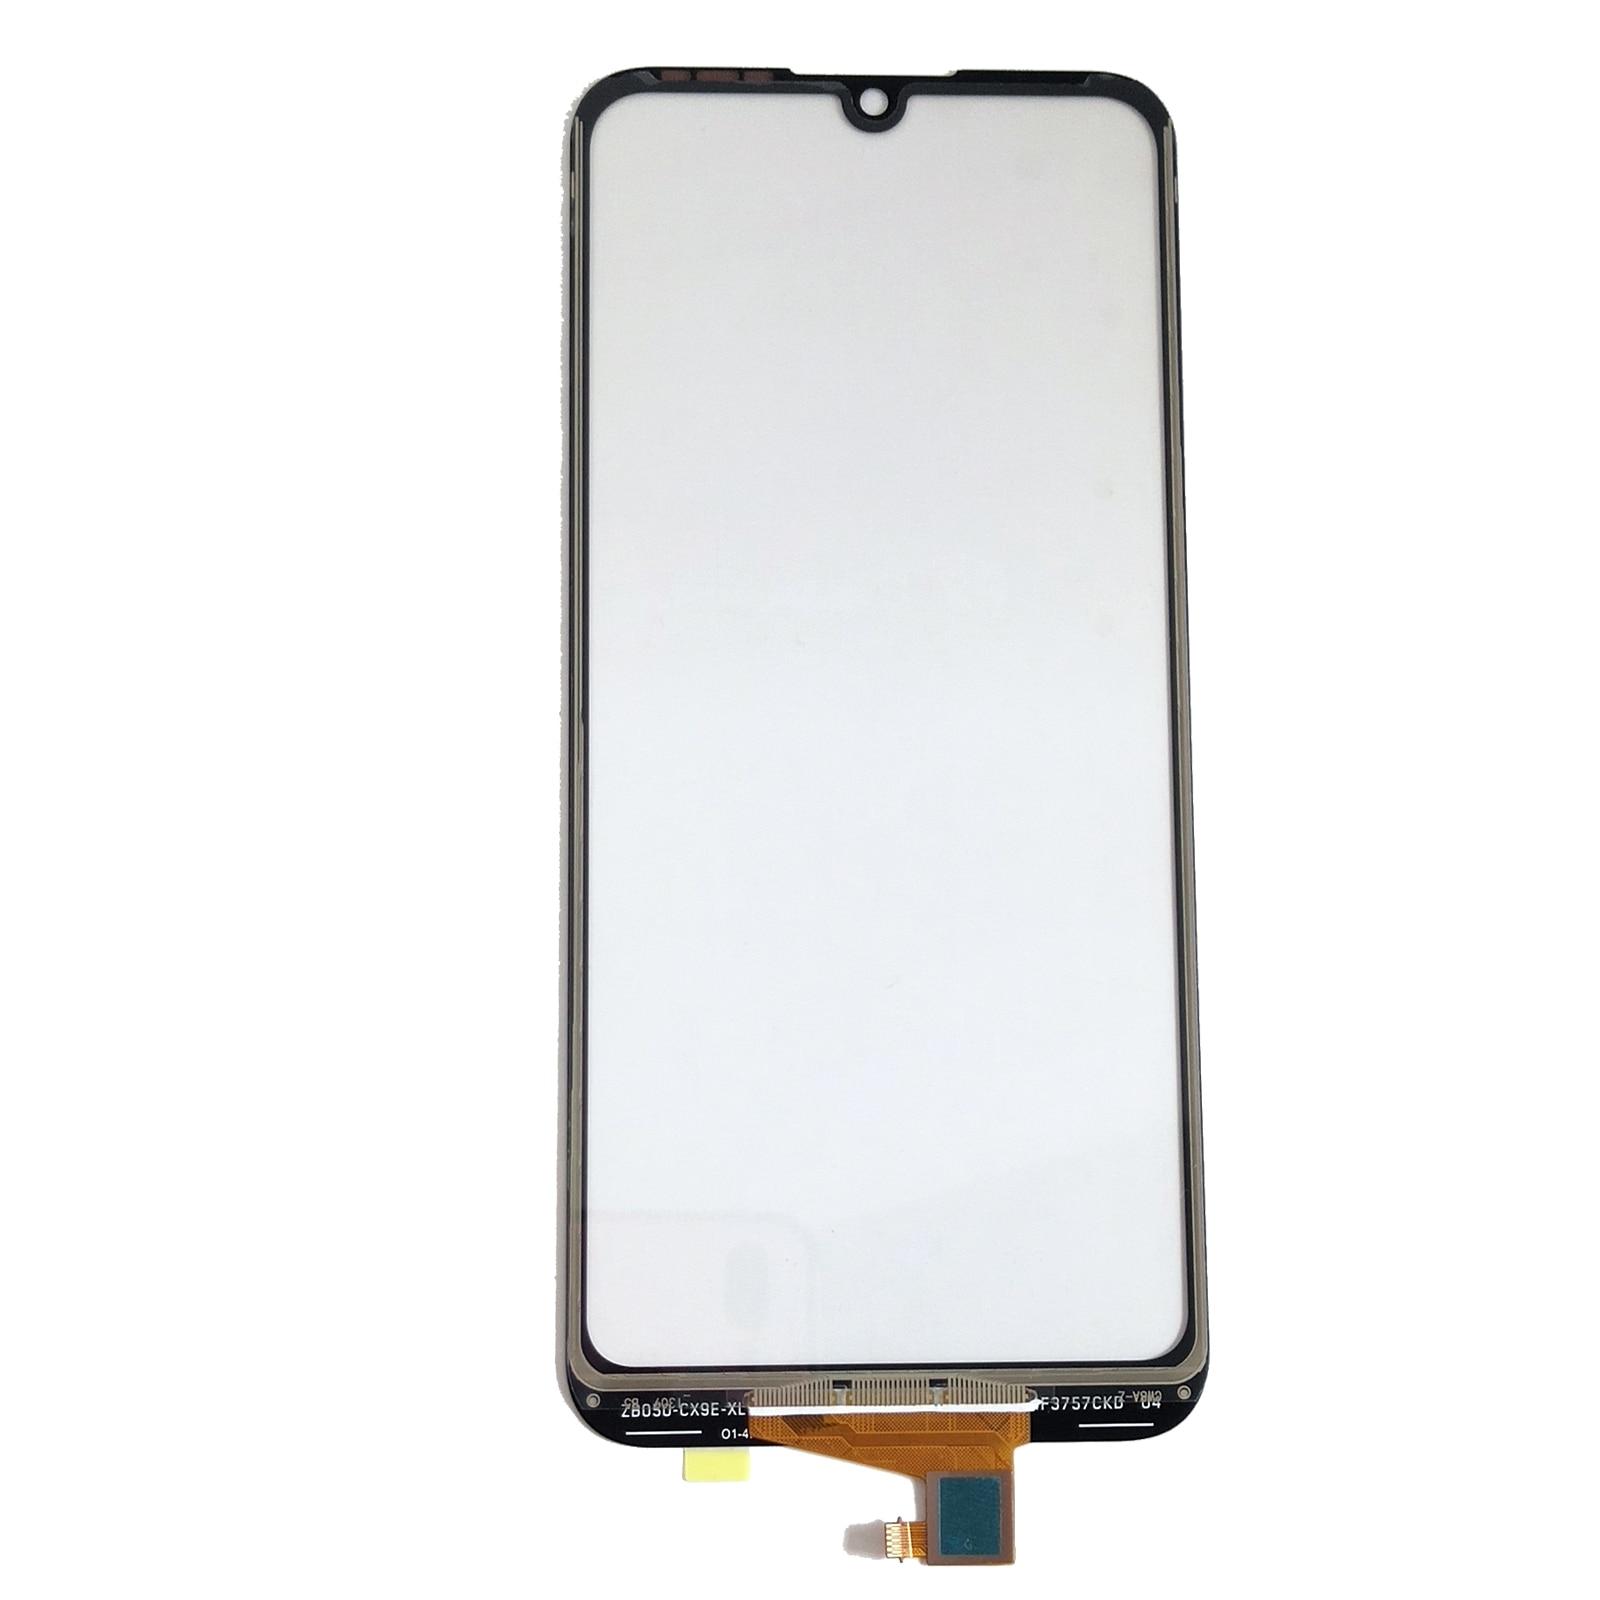 "פלאזמה Shyueda 100% בניו 6.09"" עבור Huawei Y6 Pro 2019 MRD-LX2 L22 L23 Outer חזית זכוכית מסך מגע (3)"